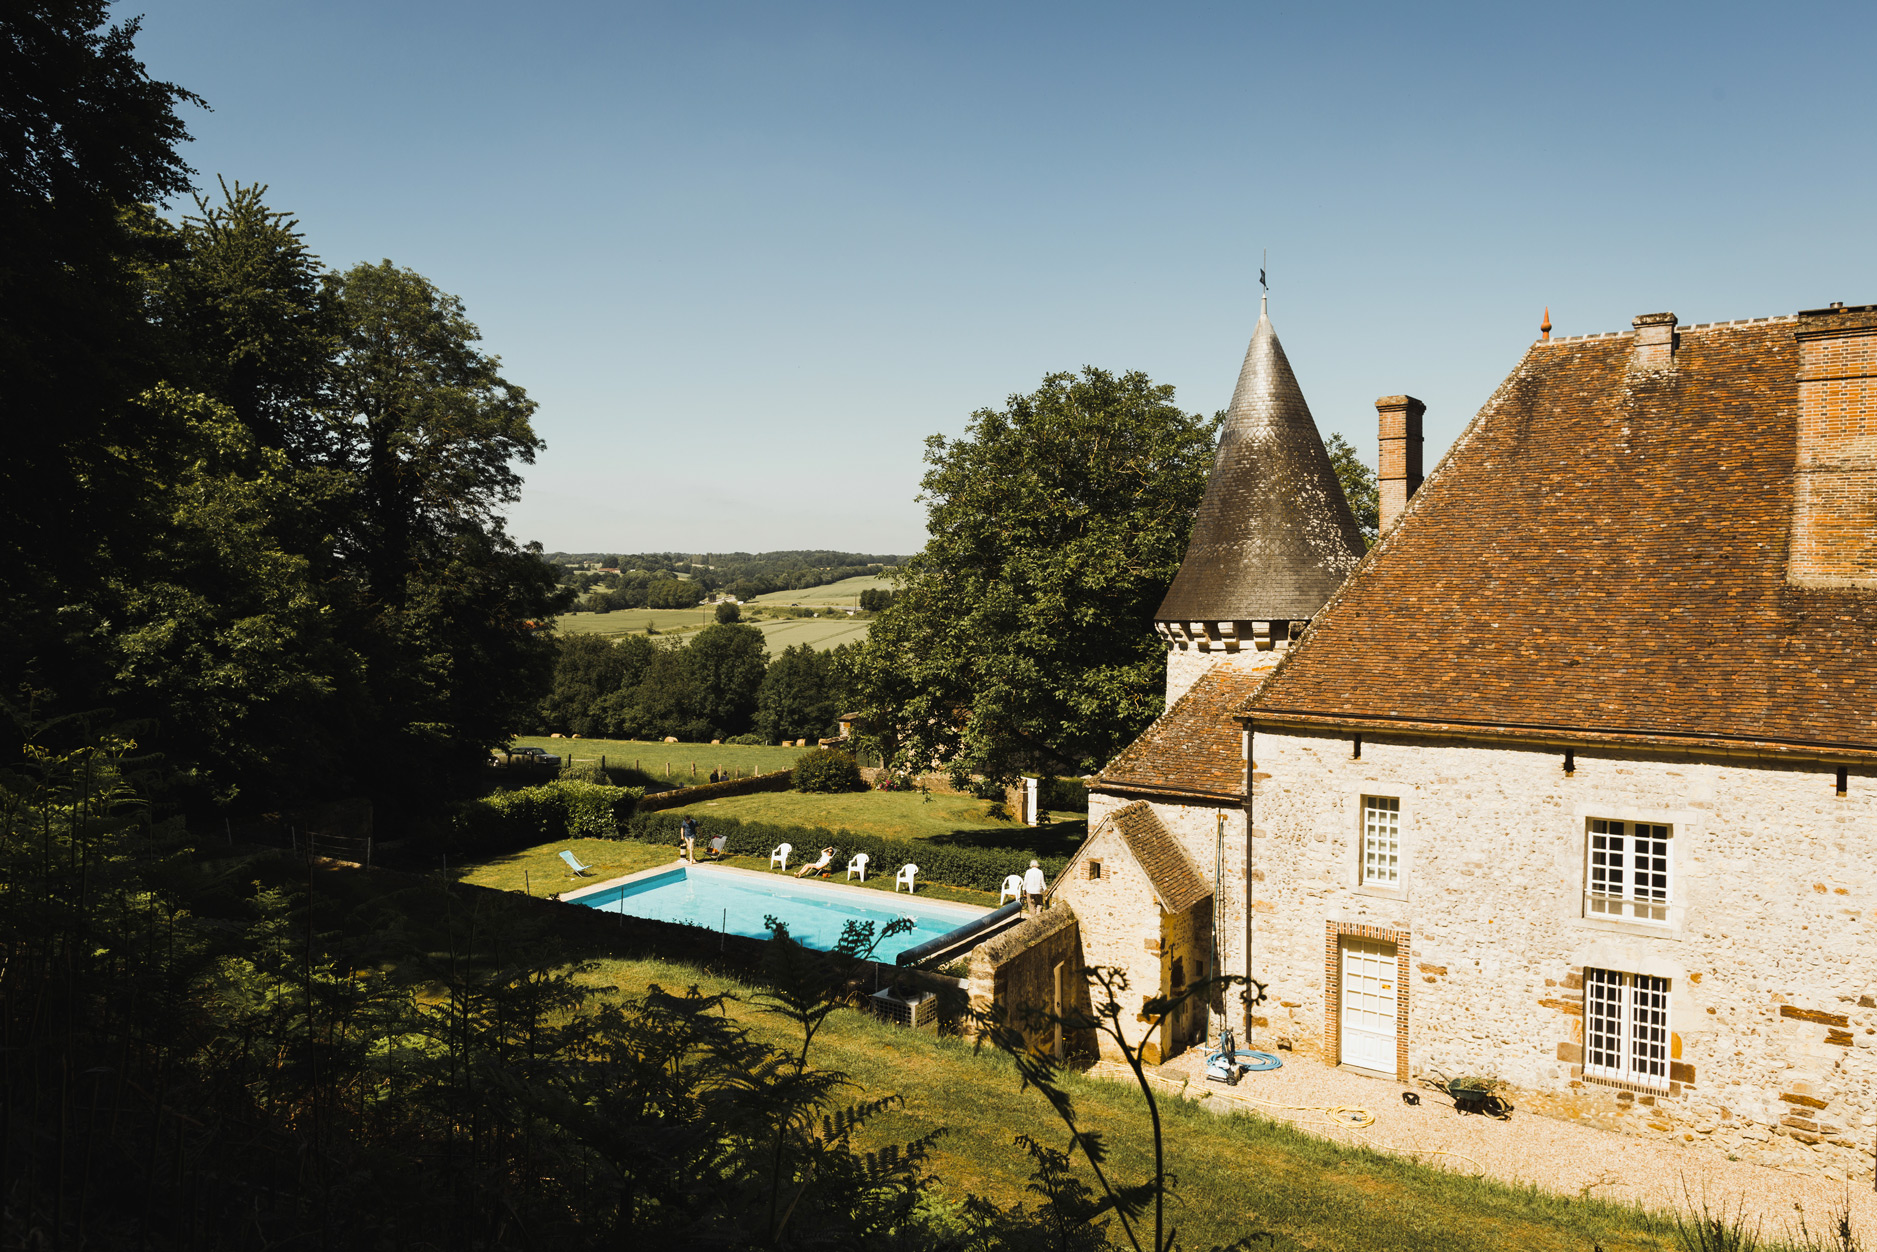 La piscine et la façade arrière du manoir de Bellegarde